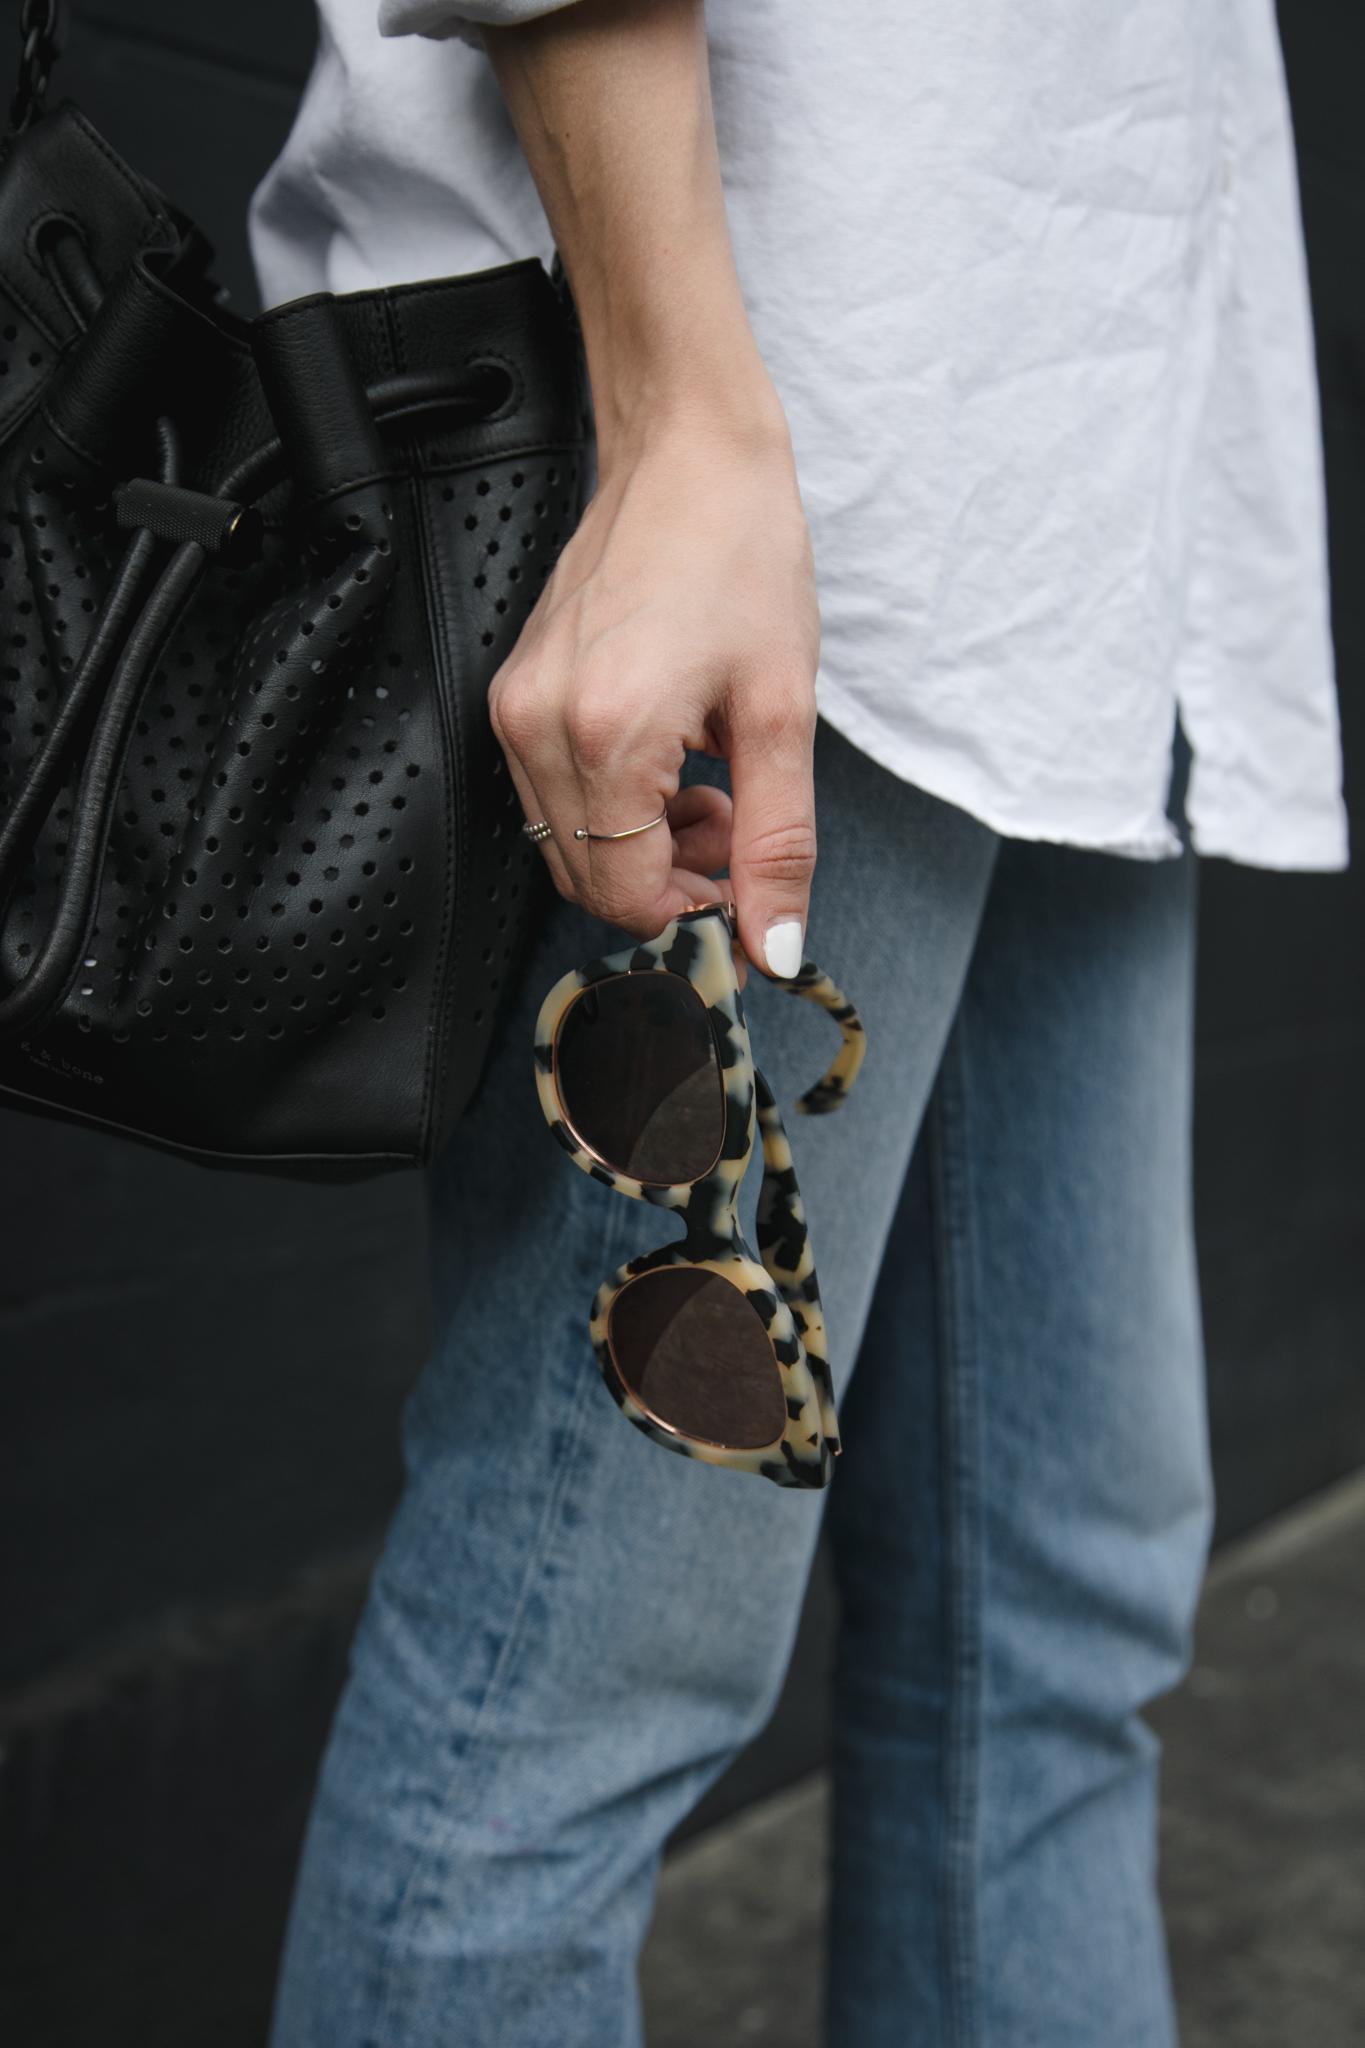 sharday-engel-frank-oak-shirt-fifth-sunglasses-helmut-lang-jeans6012.jpg